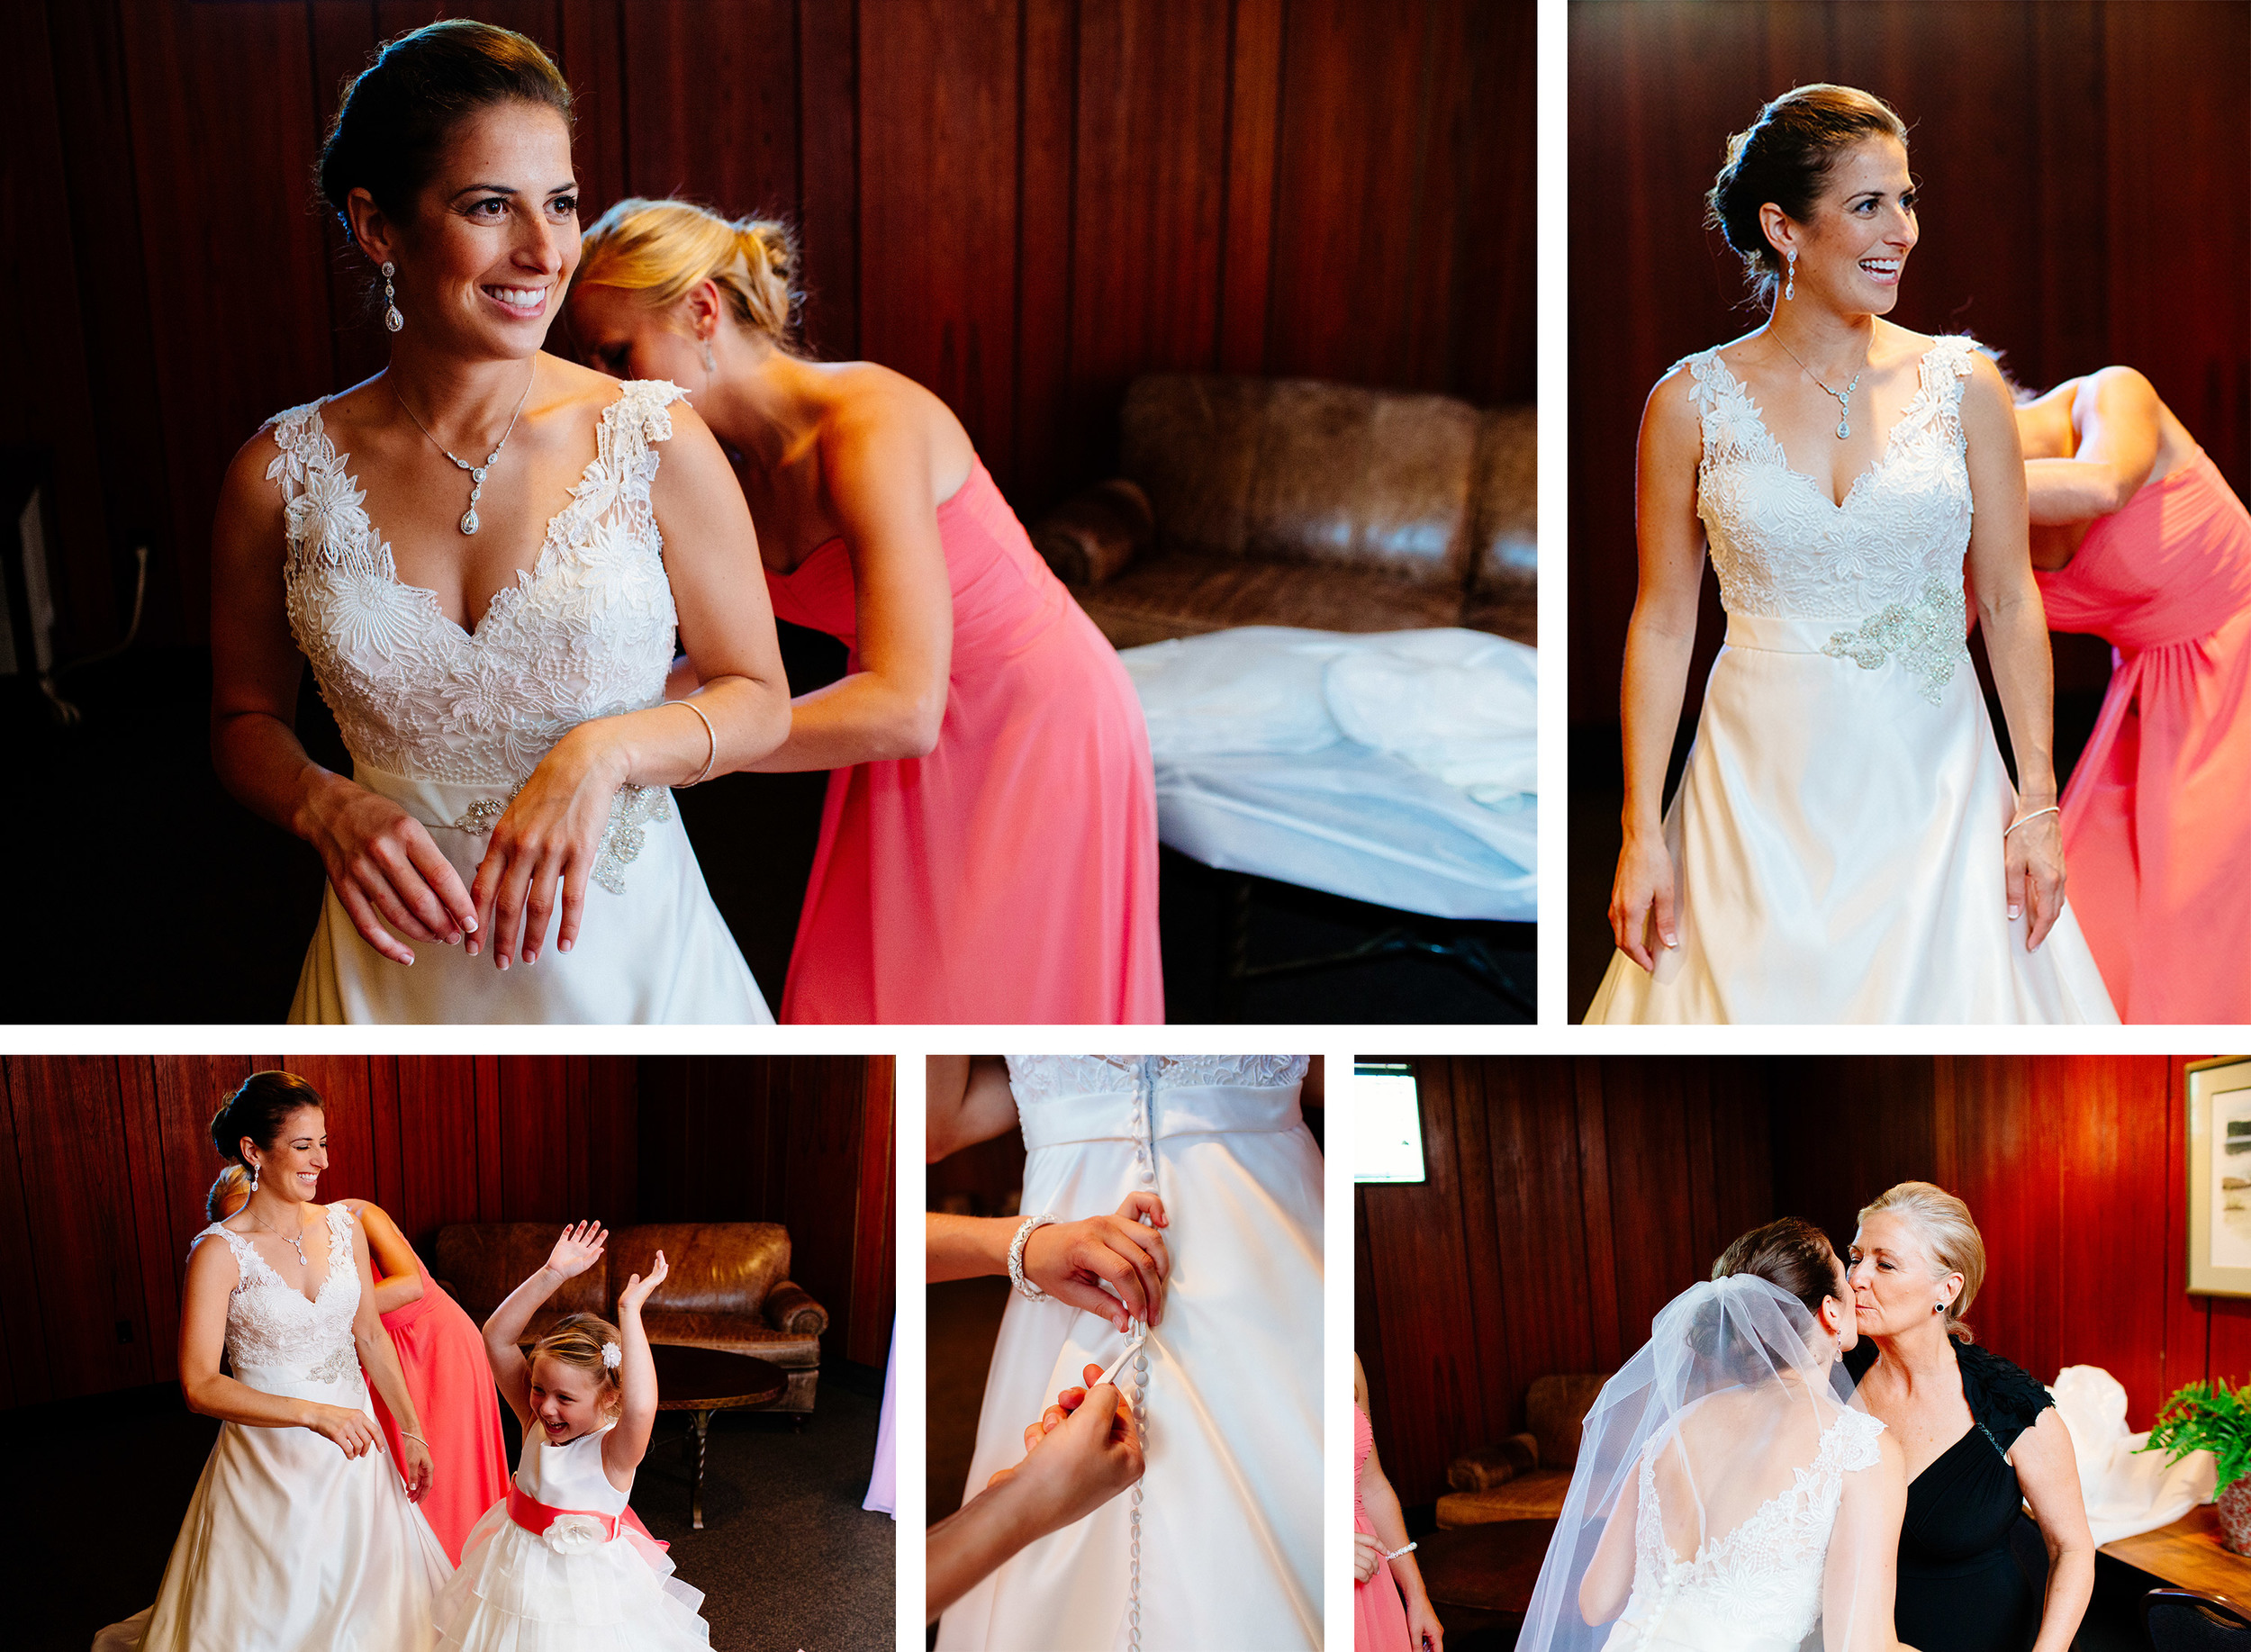 Grandview_Lodge_Wedding_03.jpg